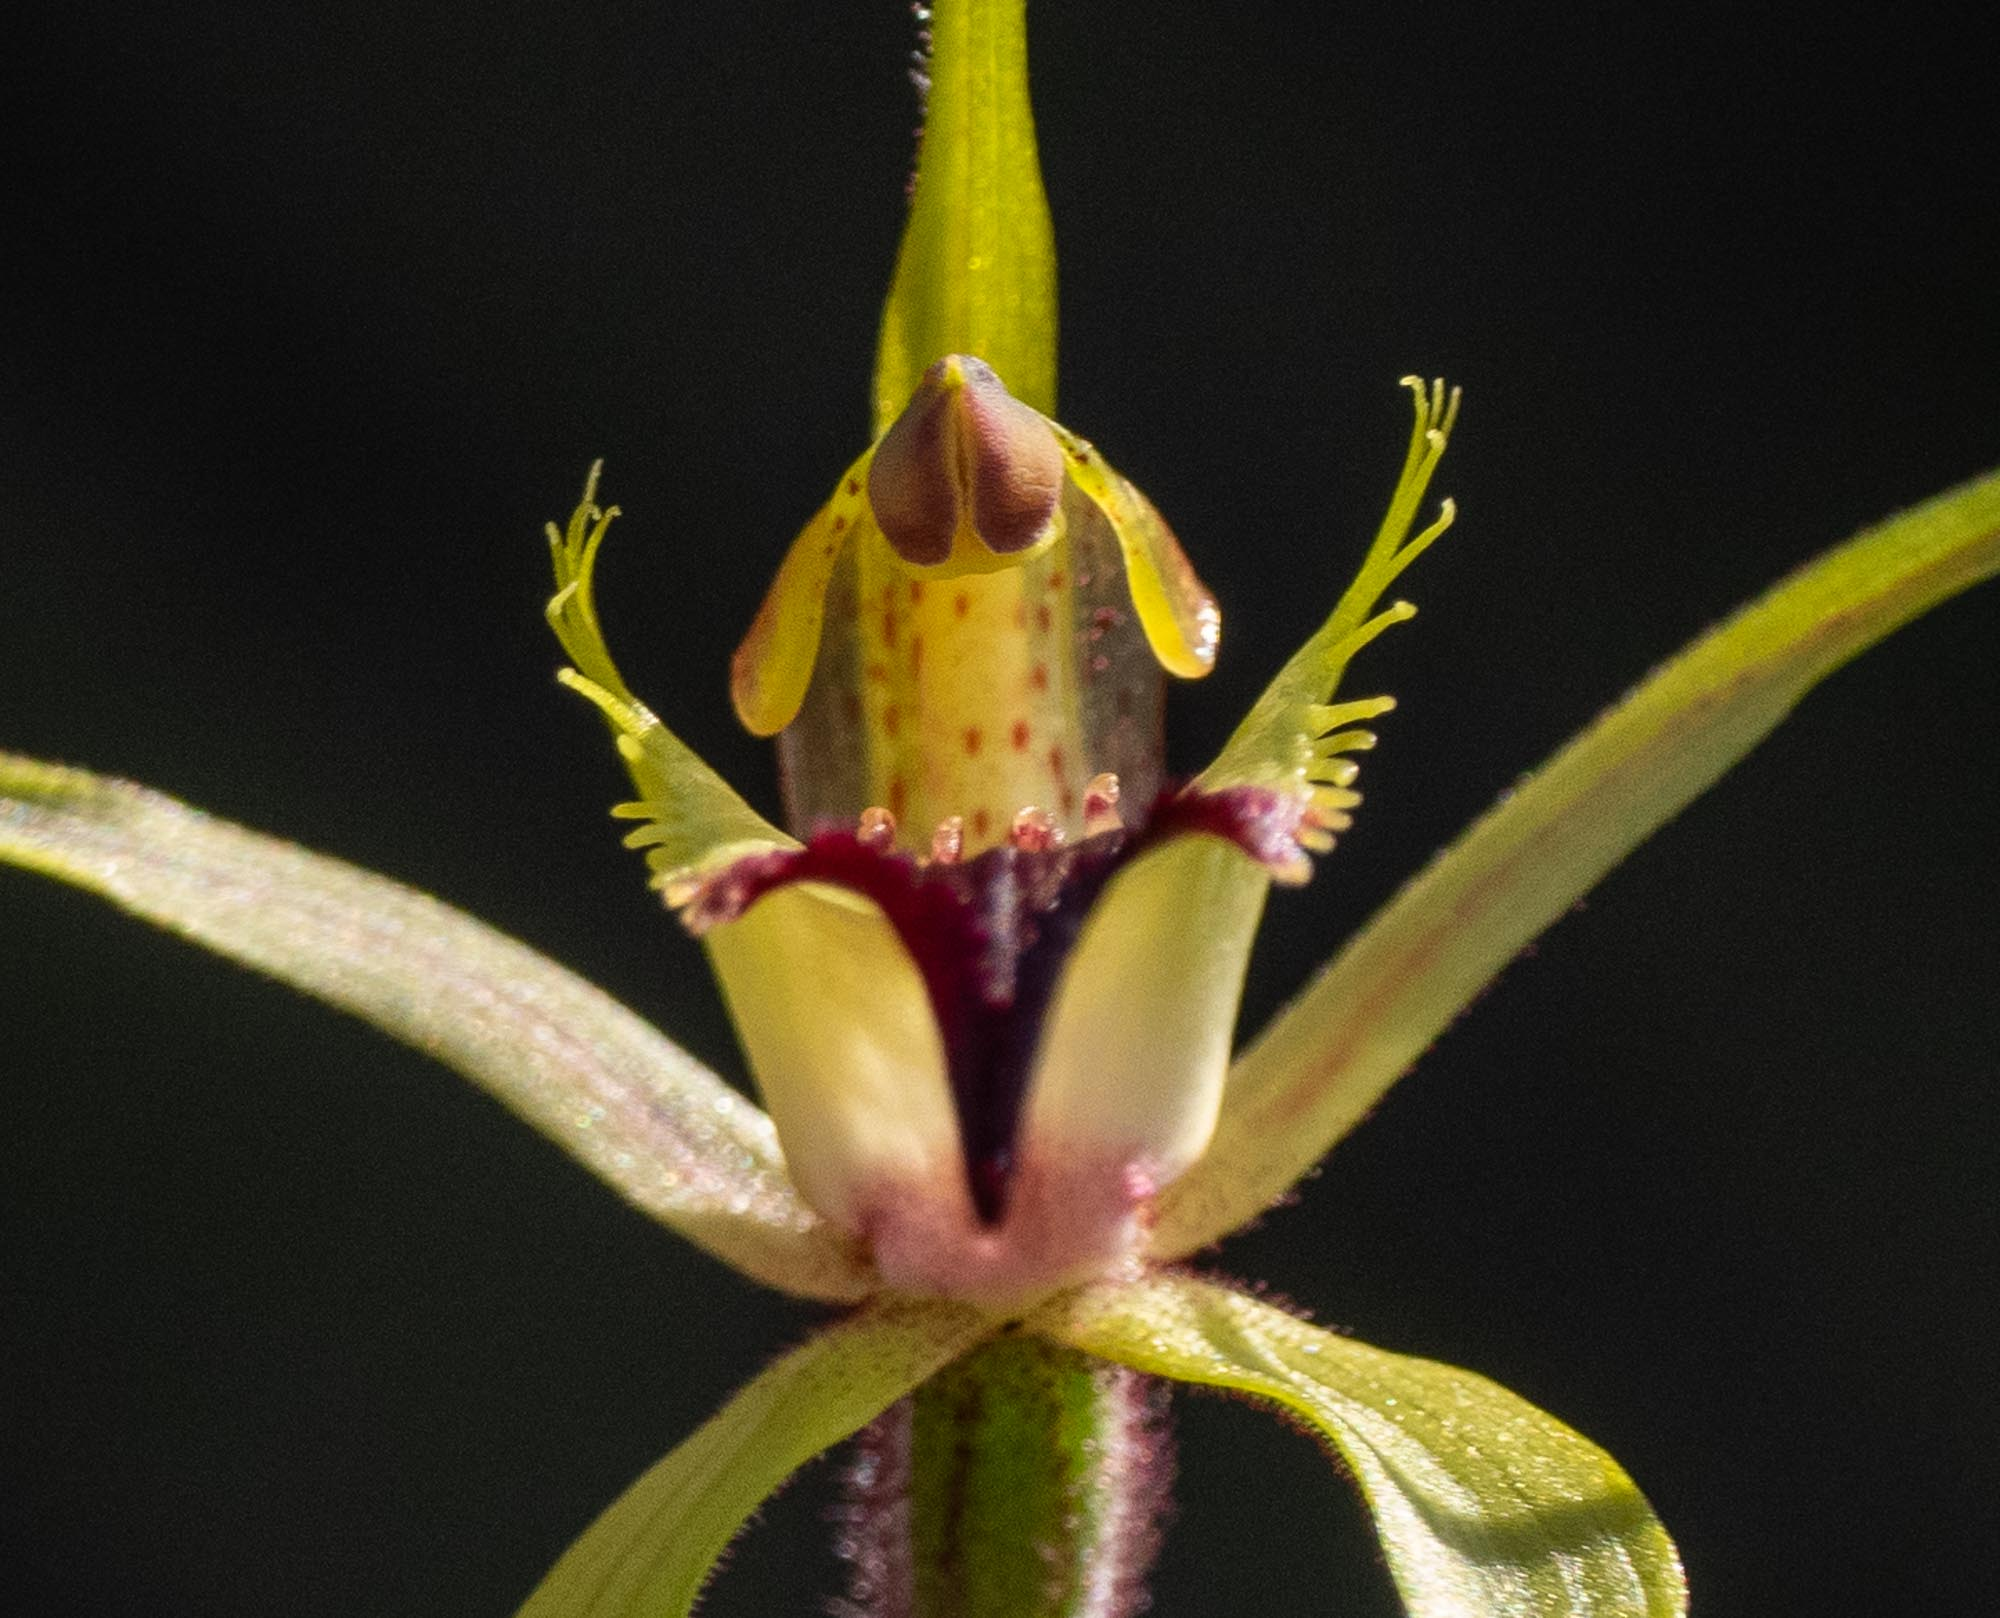 Caladenia infundibularis (Funnel-tipped Spider Orchid)